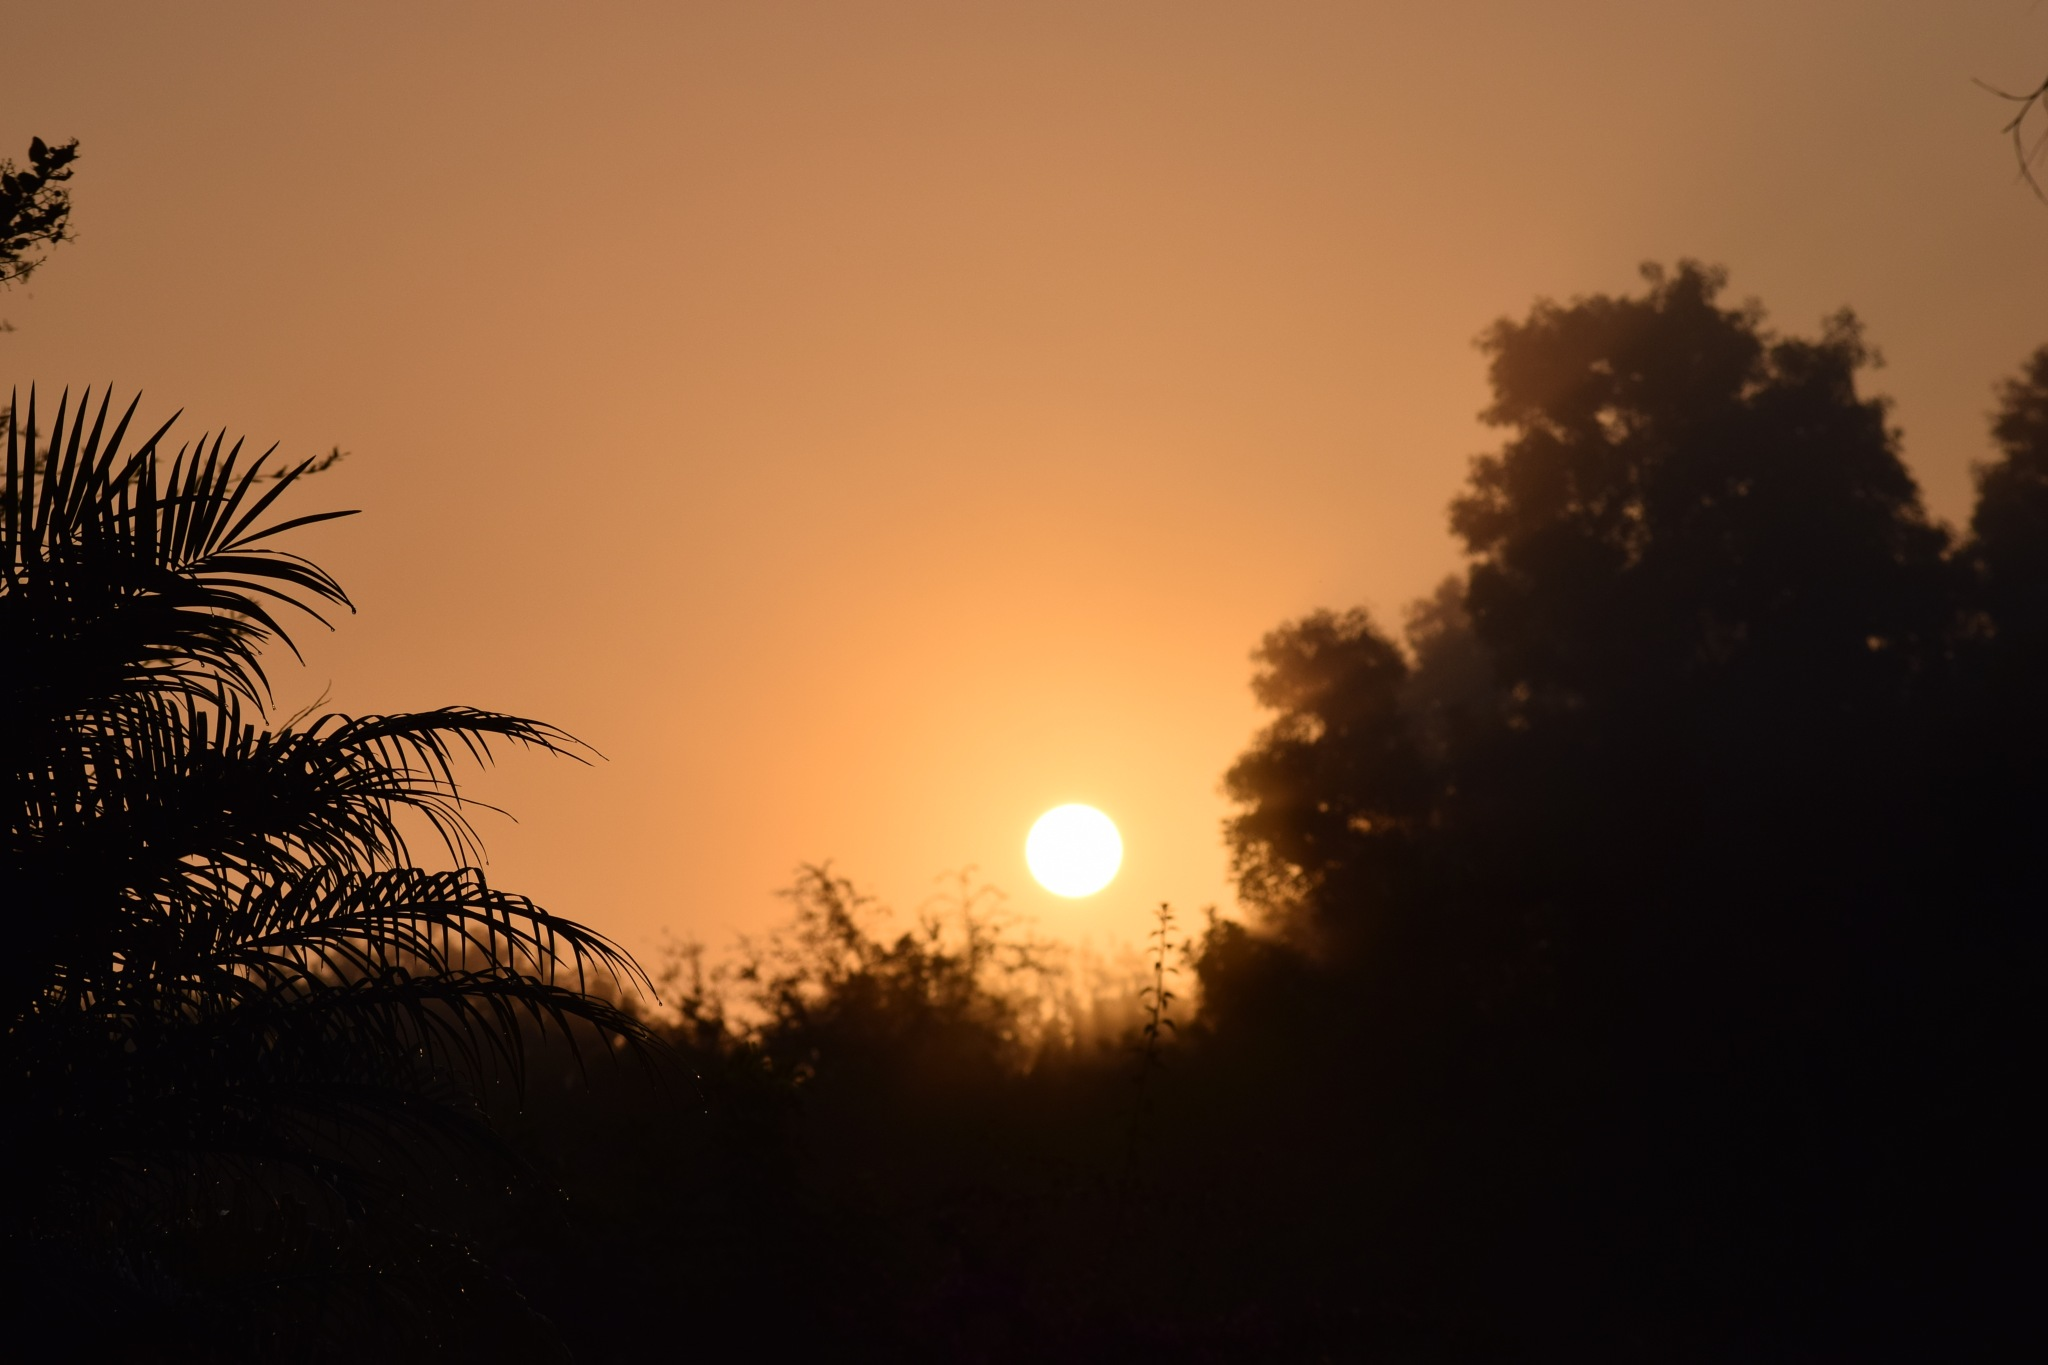 Back yard sunrise by KMcCord